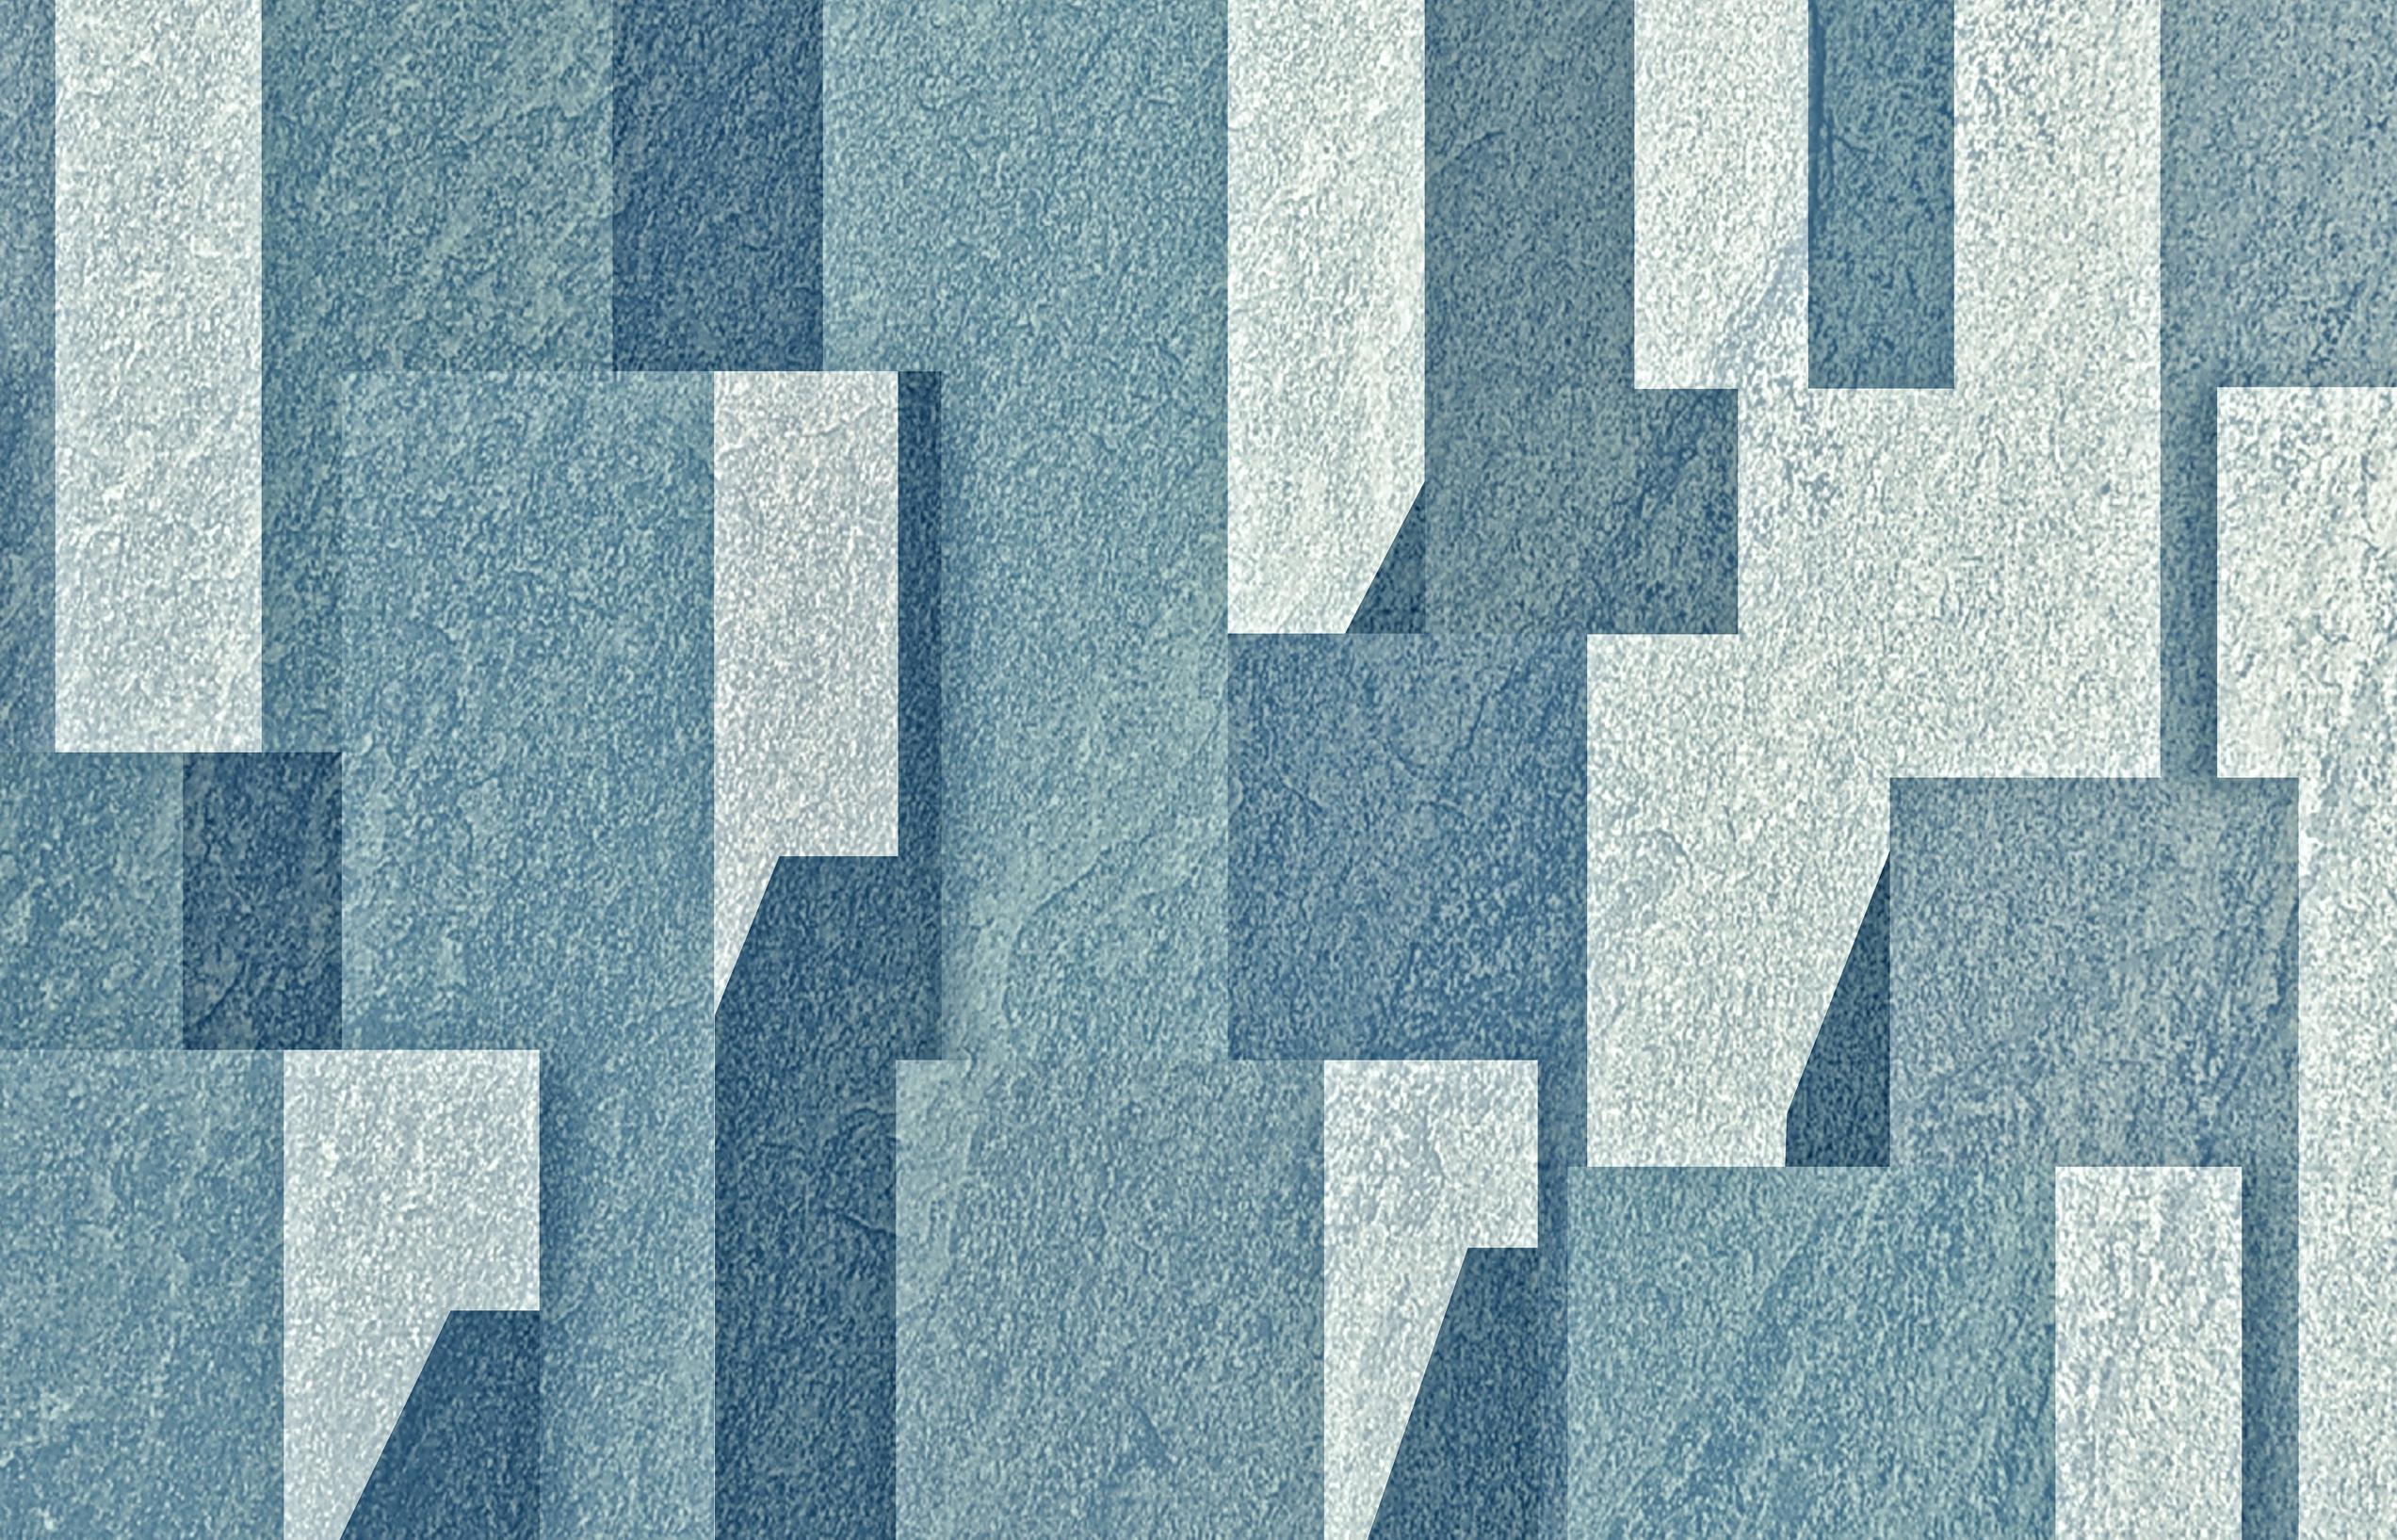 Blank Brick Wall Template